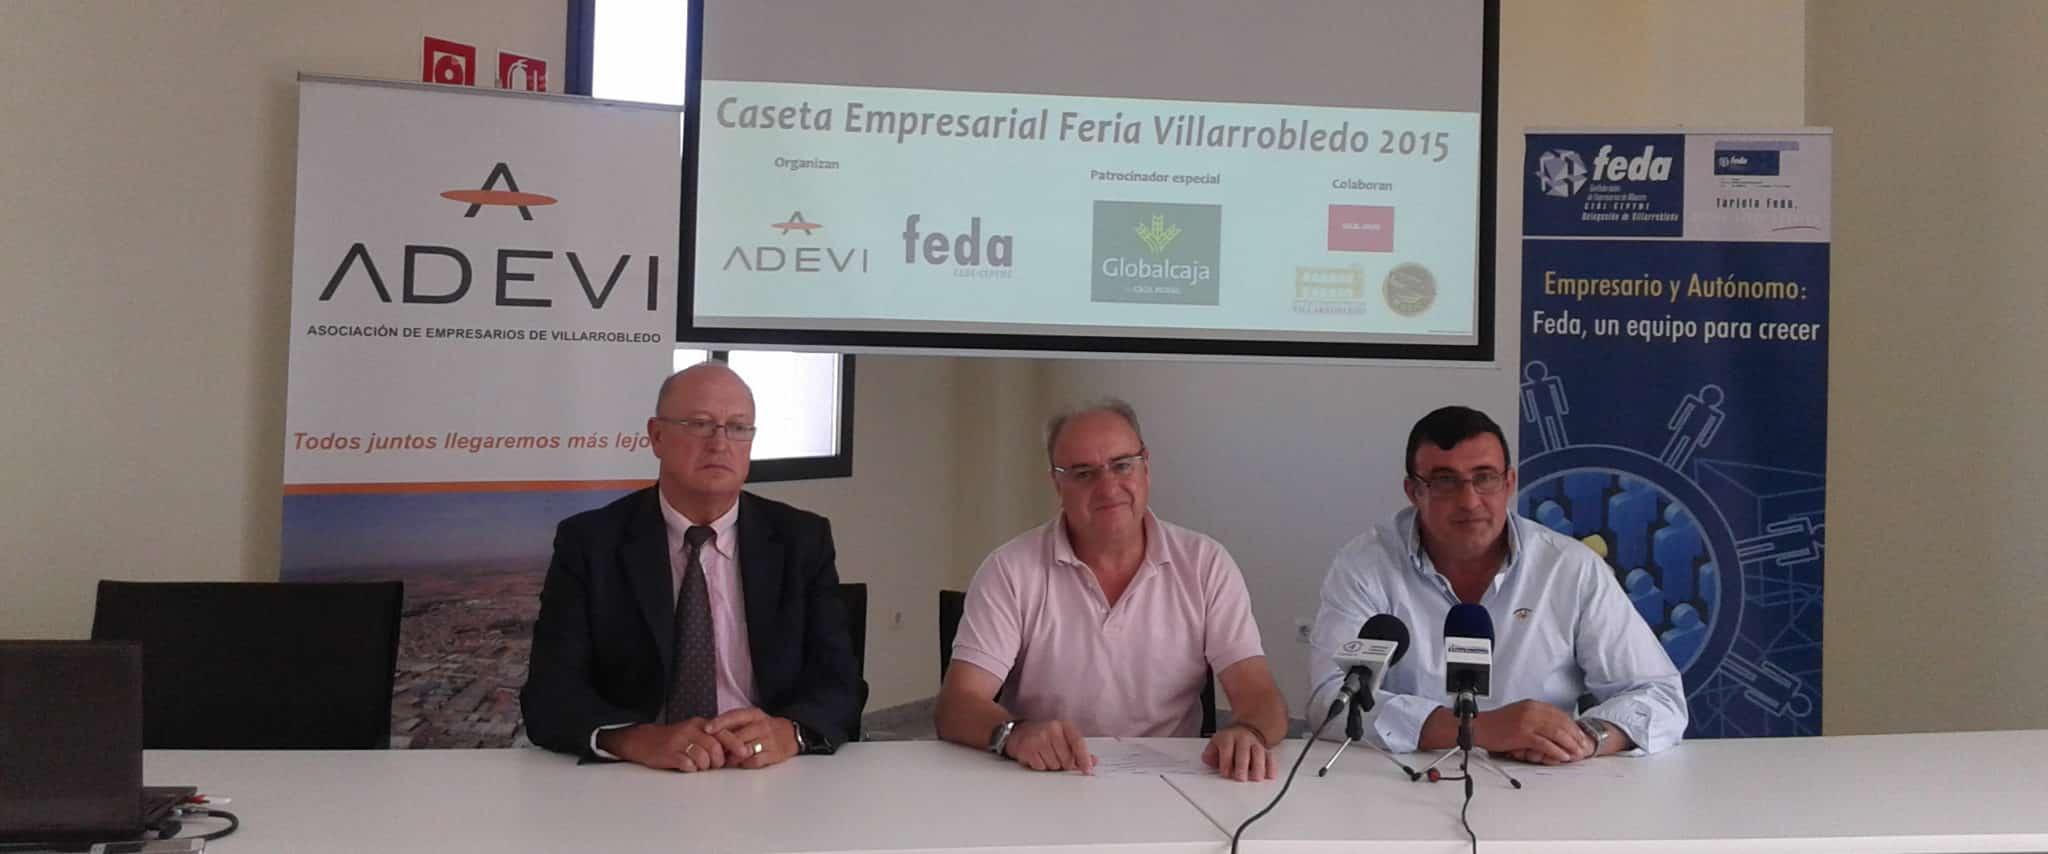 https://blog.globalcaja.es/wp-content/uploads/2015/08/globalcaja-empresarios-villarrobledo-adevi-feda.jpg